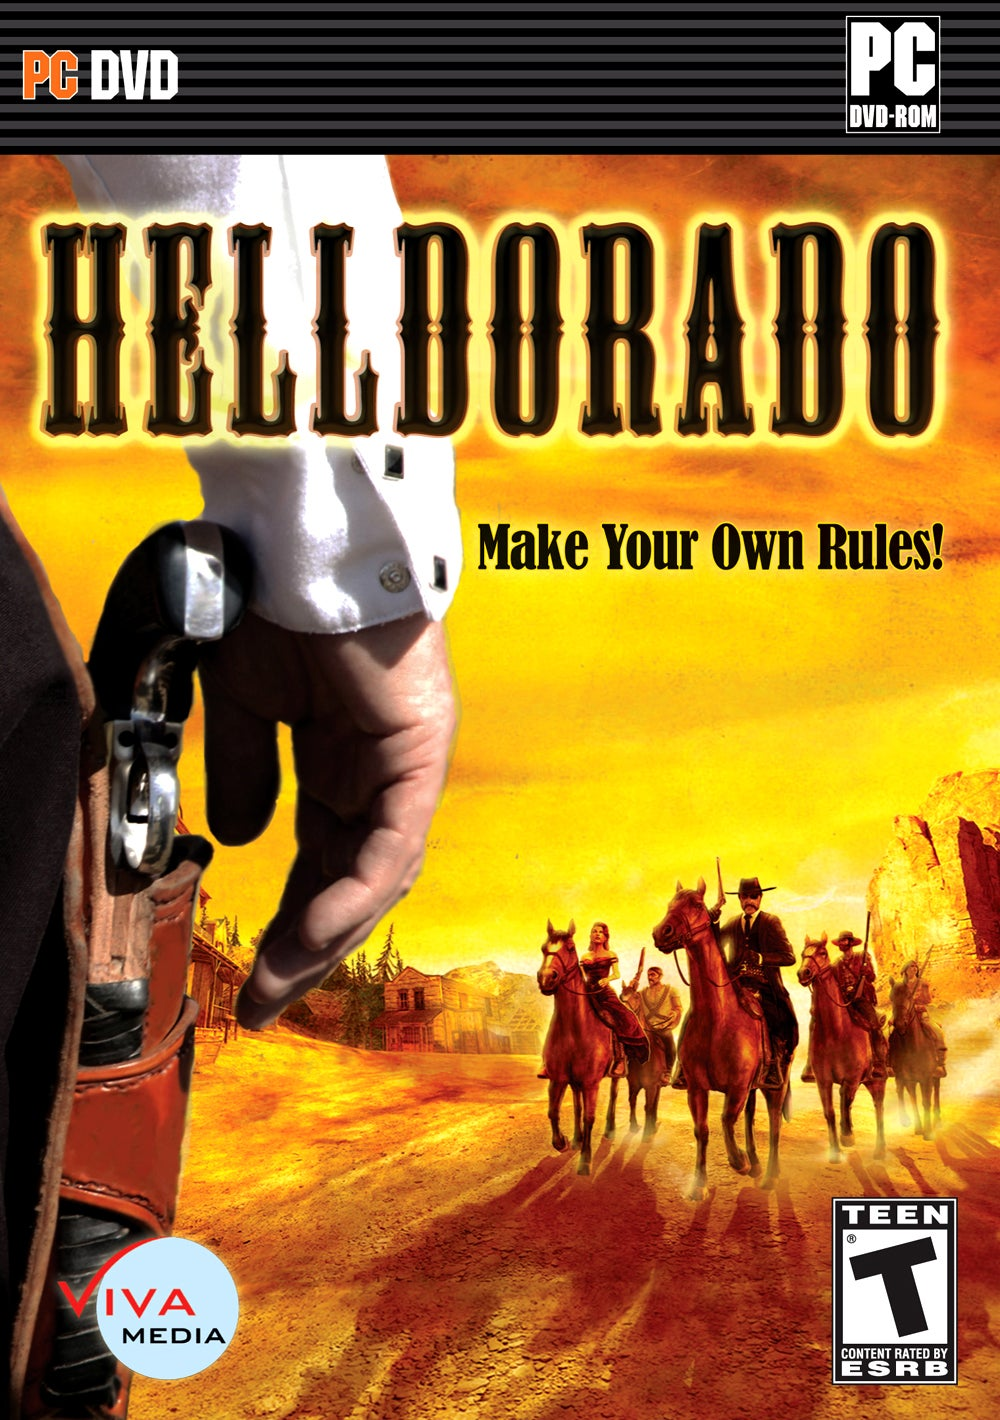 Helldorado Review IGN